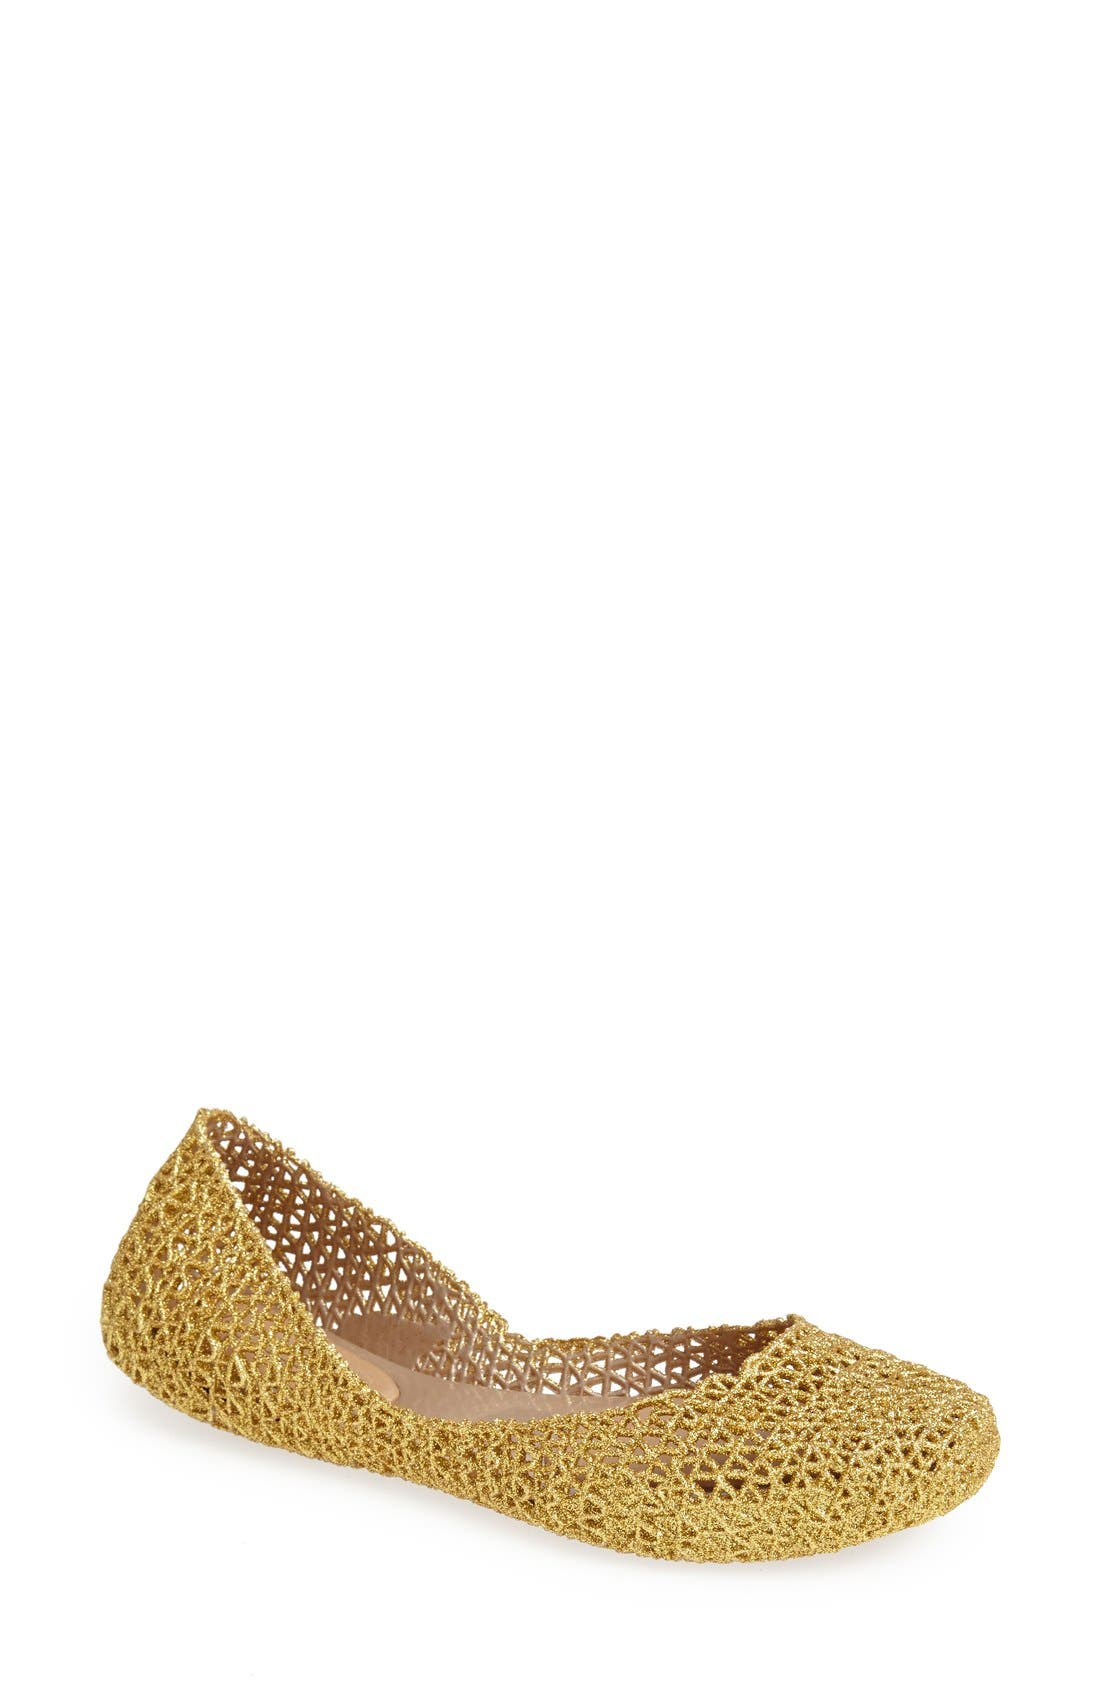 'Campana Papel Vii' Jelly Flat, Gold Glitter